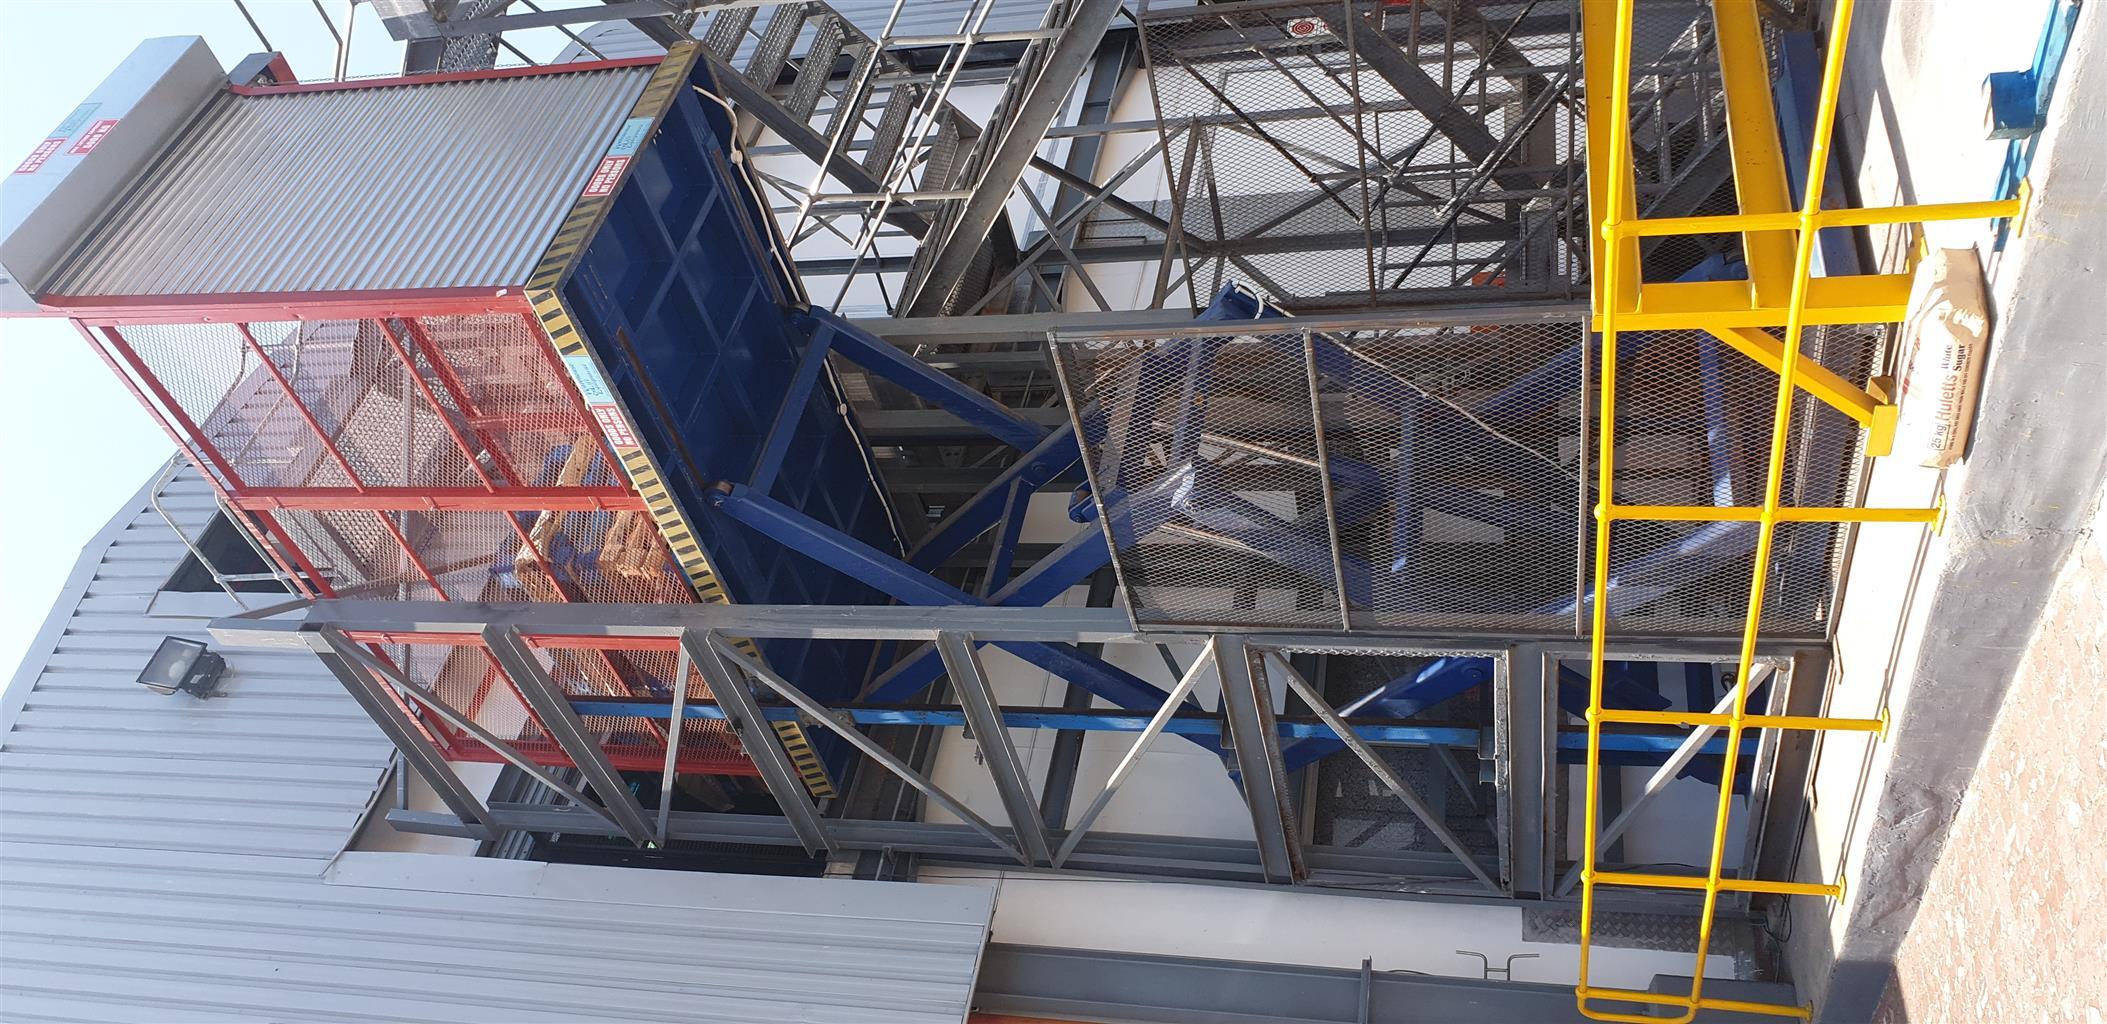 5000KG scissors  Lift Platform